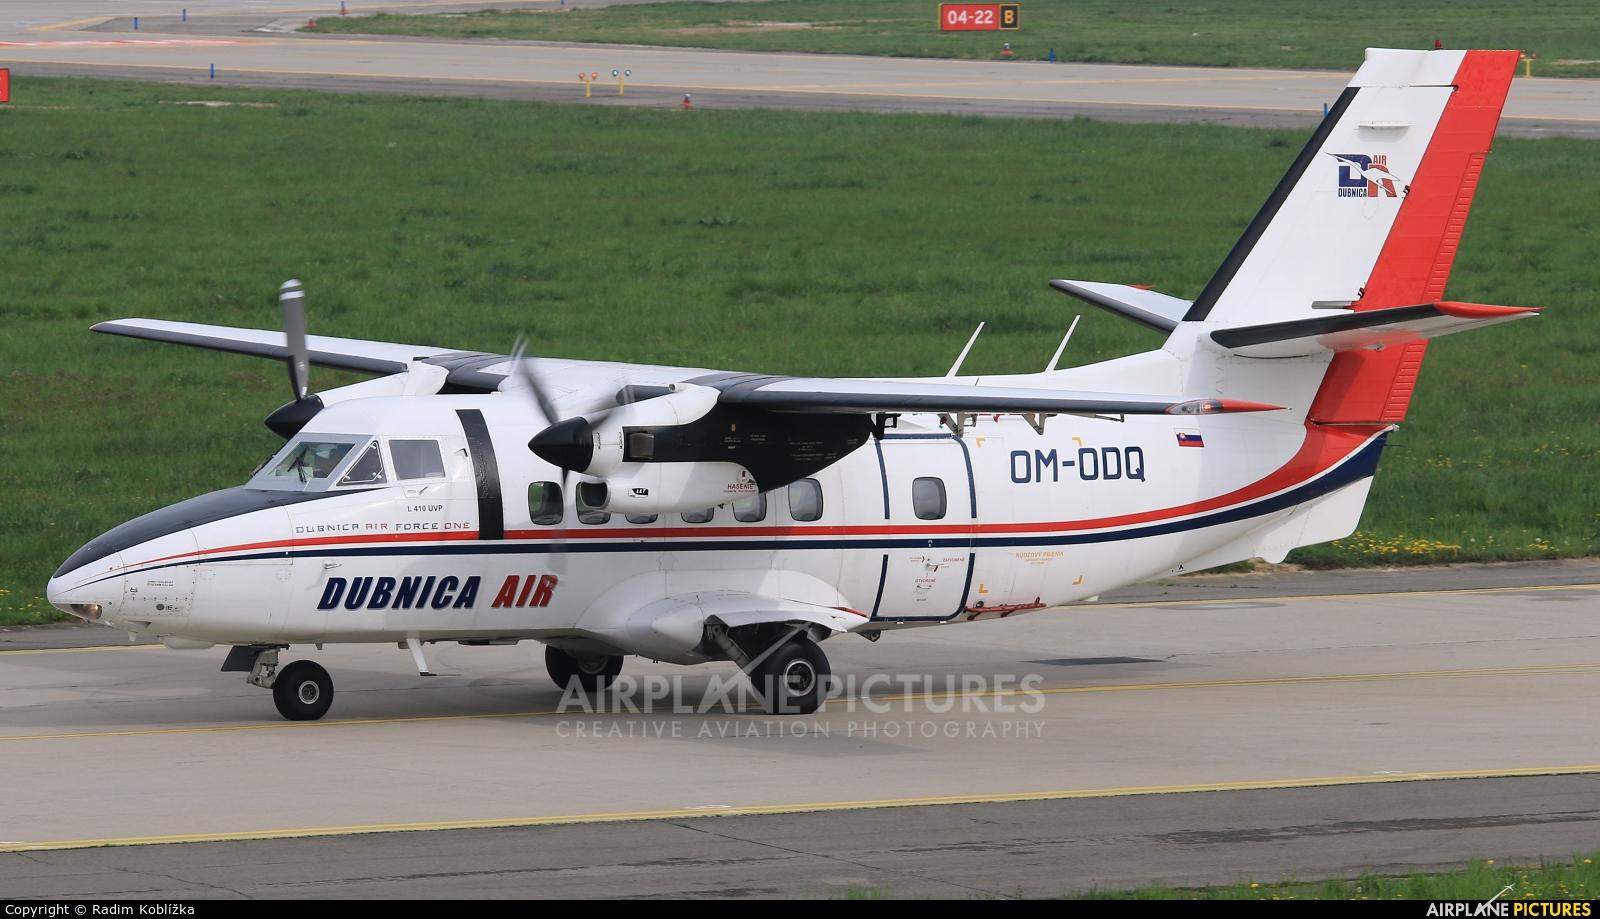 Dubnica Air OM-ODQ aircraft at Ostrava Mošnov